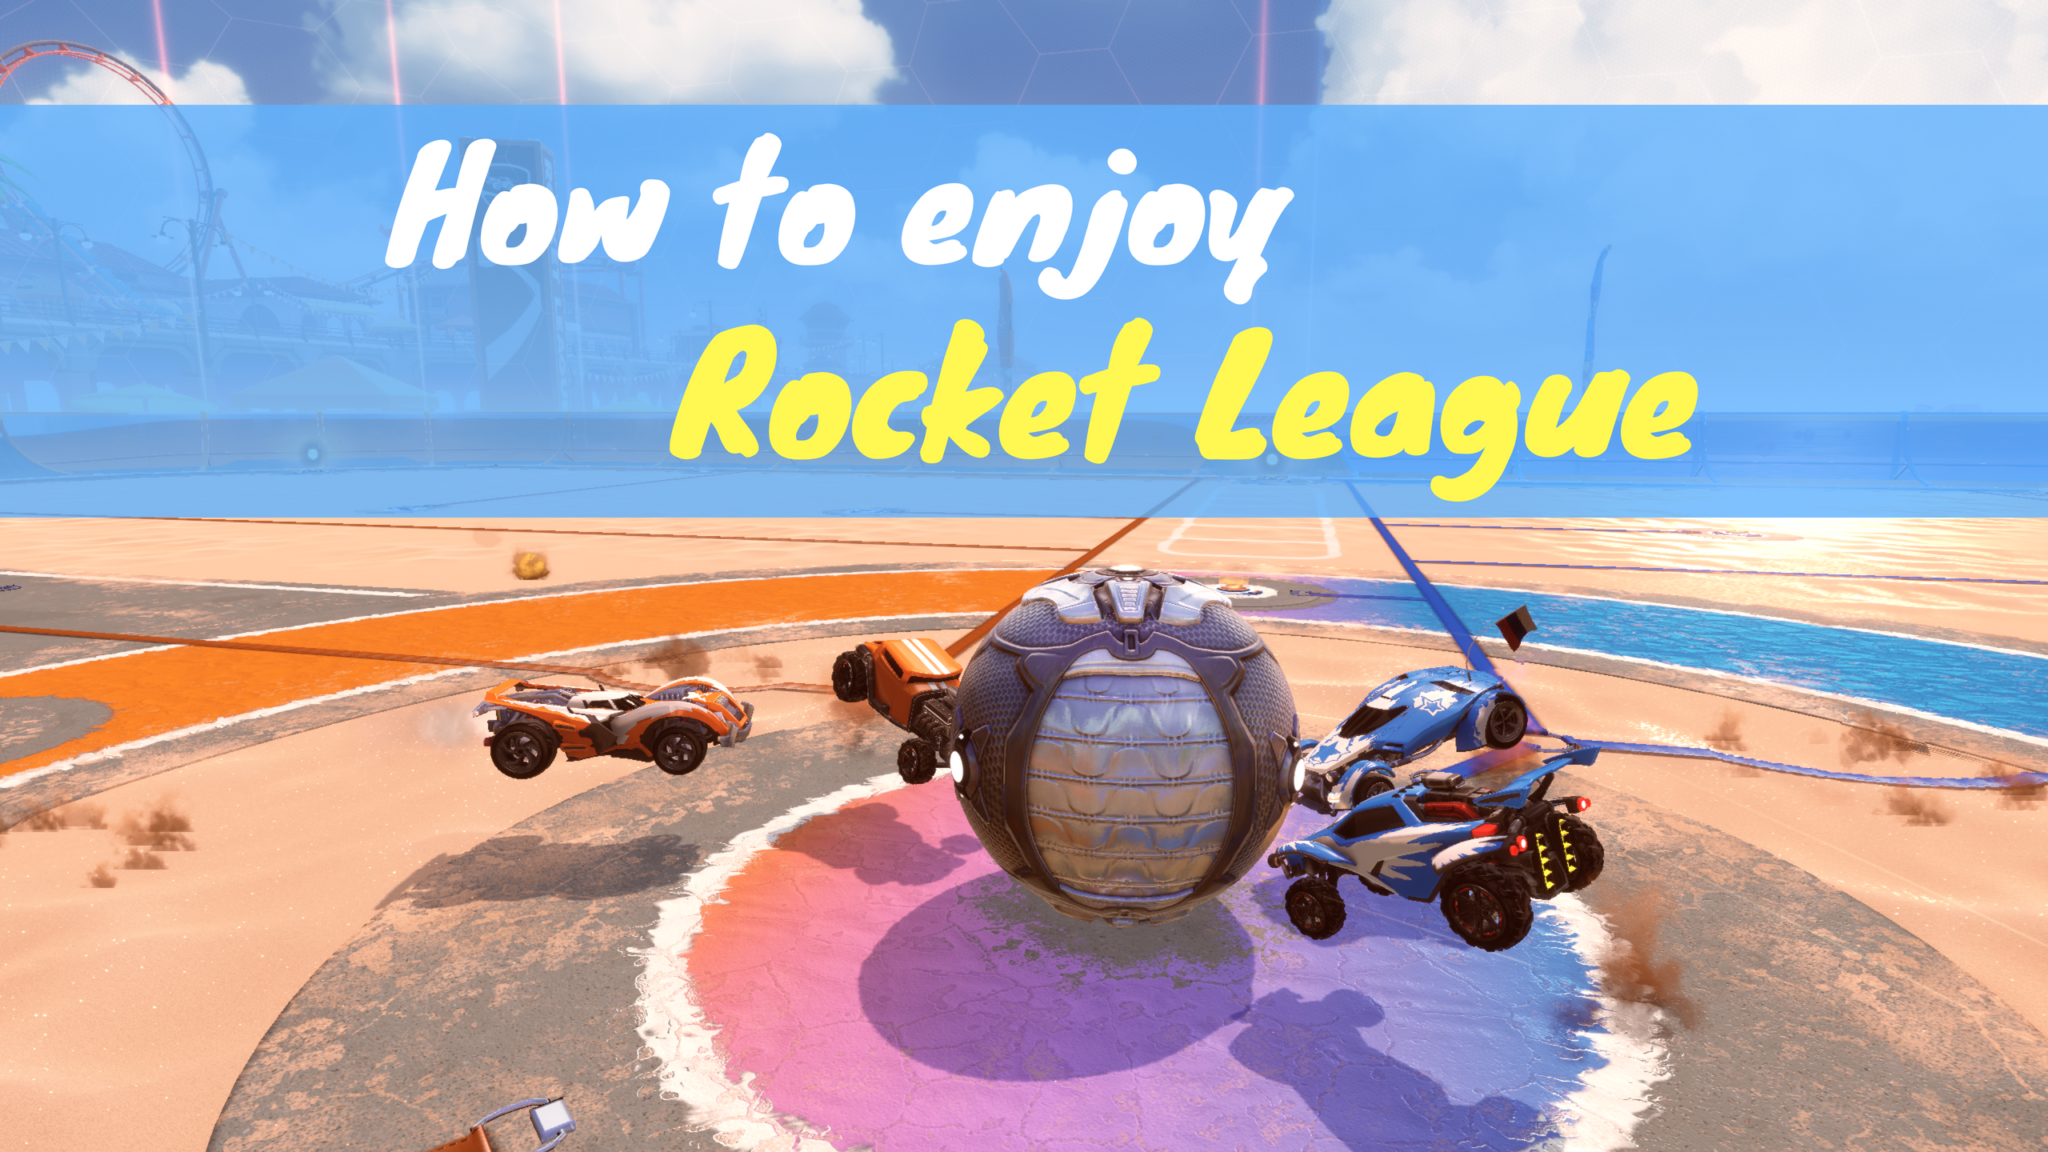 How to enjoy Rocket League